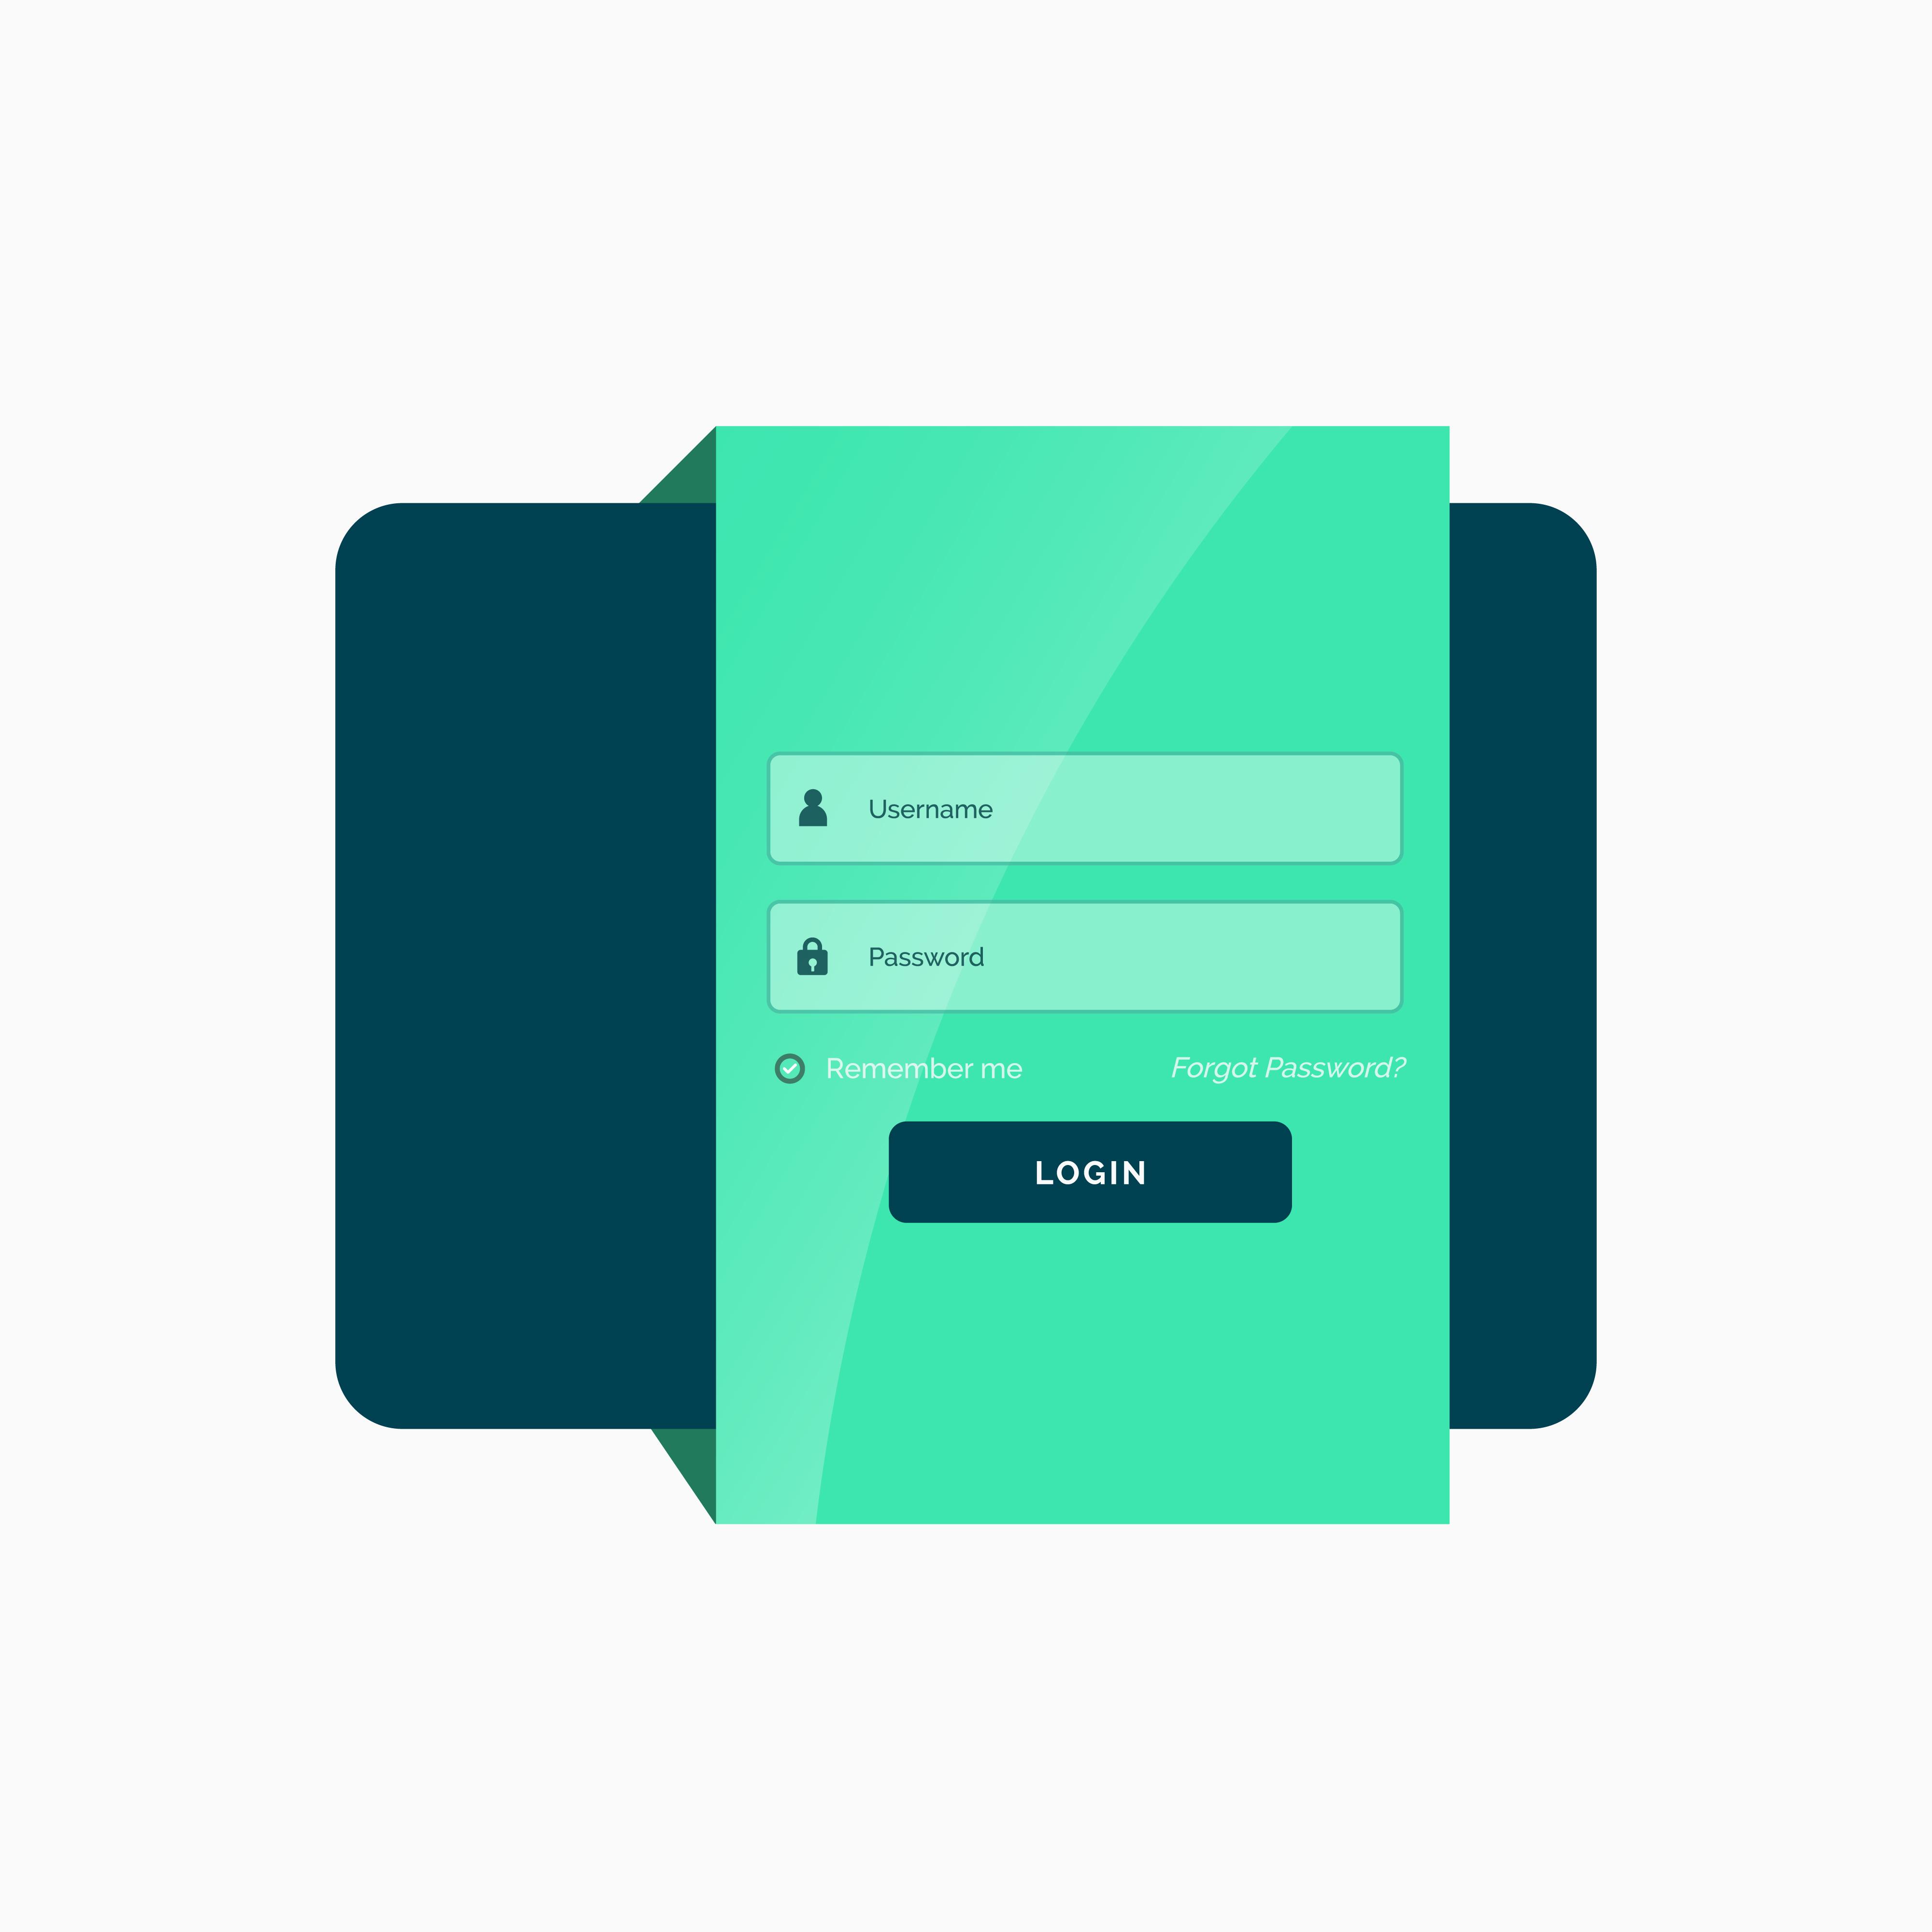 user interface design document template - flat green login user interface template design download